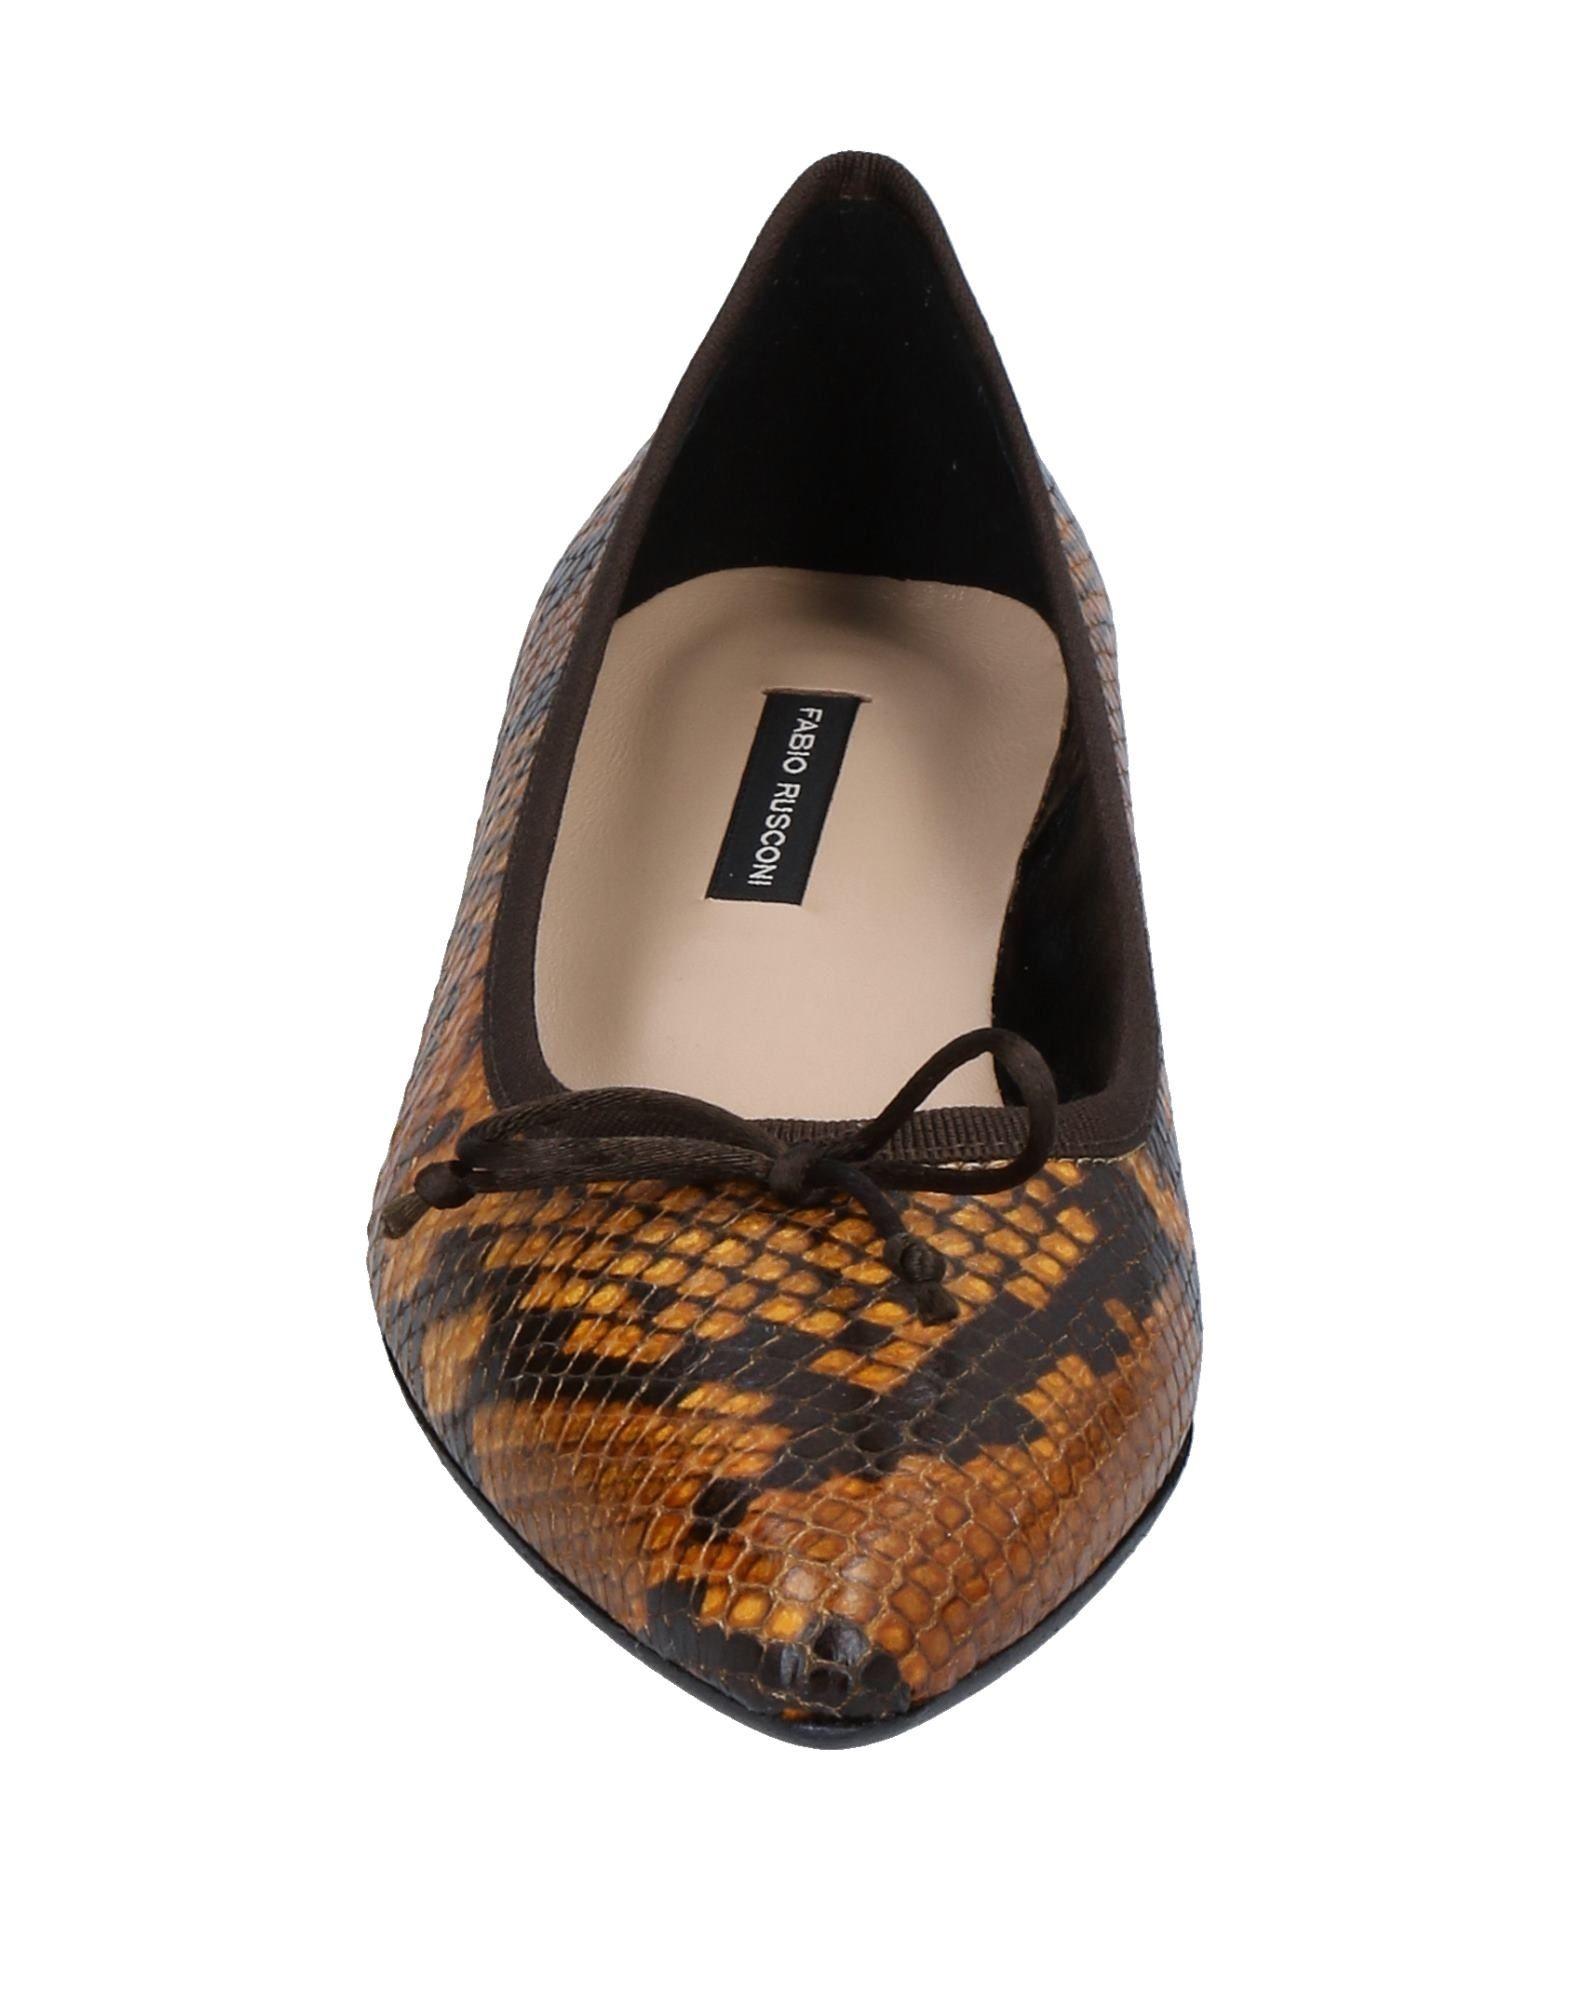 Fabio Rusconi Ballerinas Damen    11532319LB Gute Qualität beliebte Schuhe 24481d